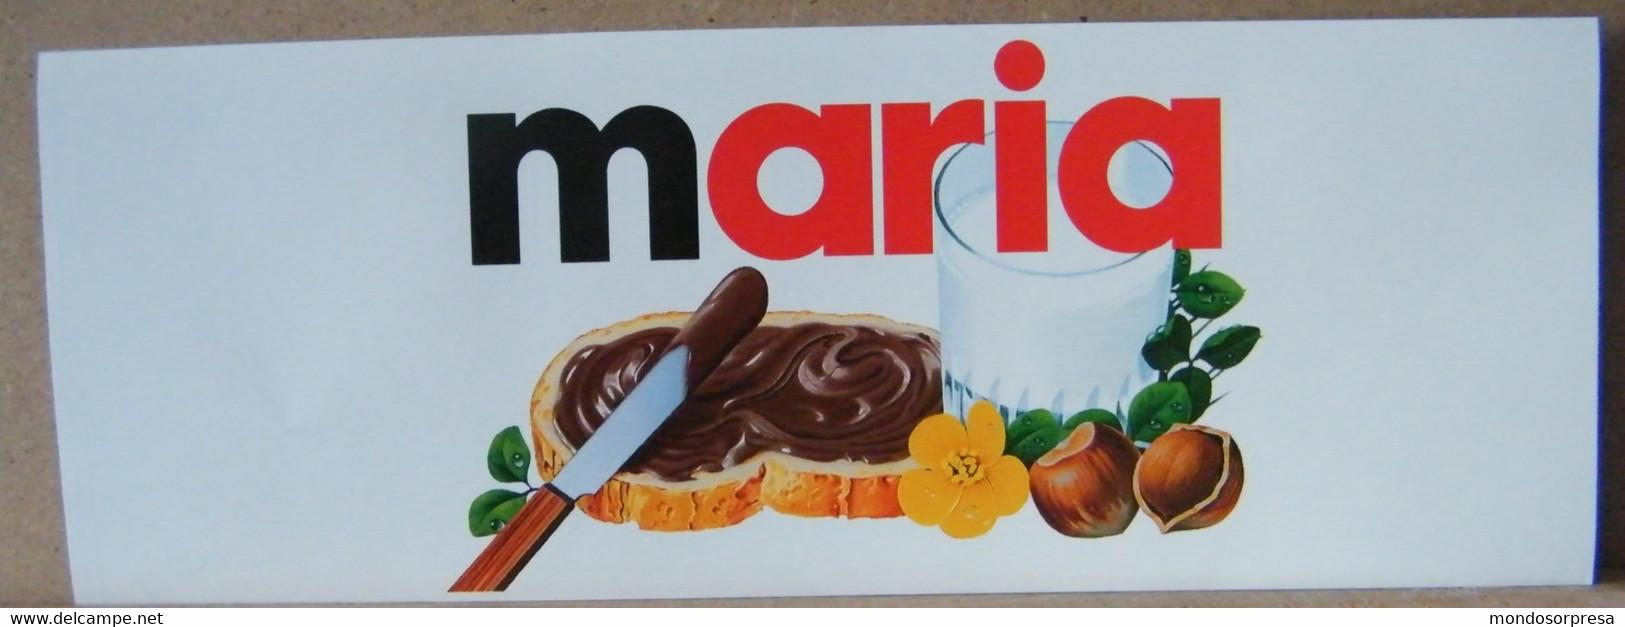 MONDOSORPRESA, ADESIVI NUTELLA NOMI, MARIA - Nutella